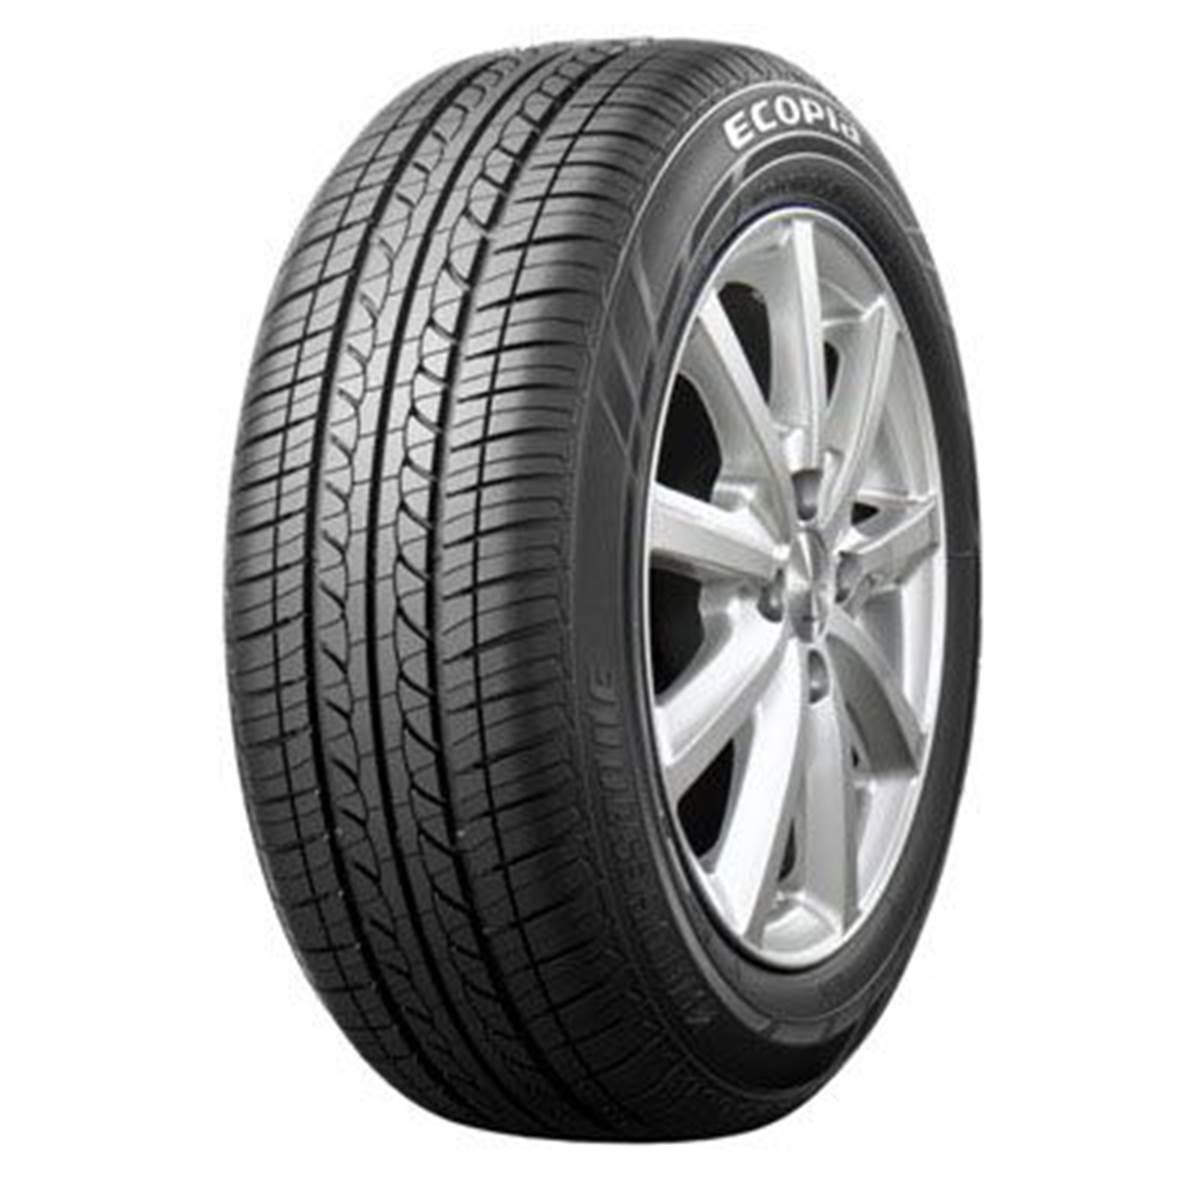 Pneu Bridgestone 185/65R15 88T Ecopia Ep25